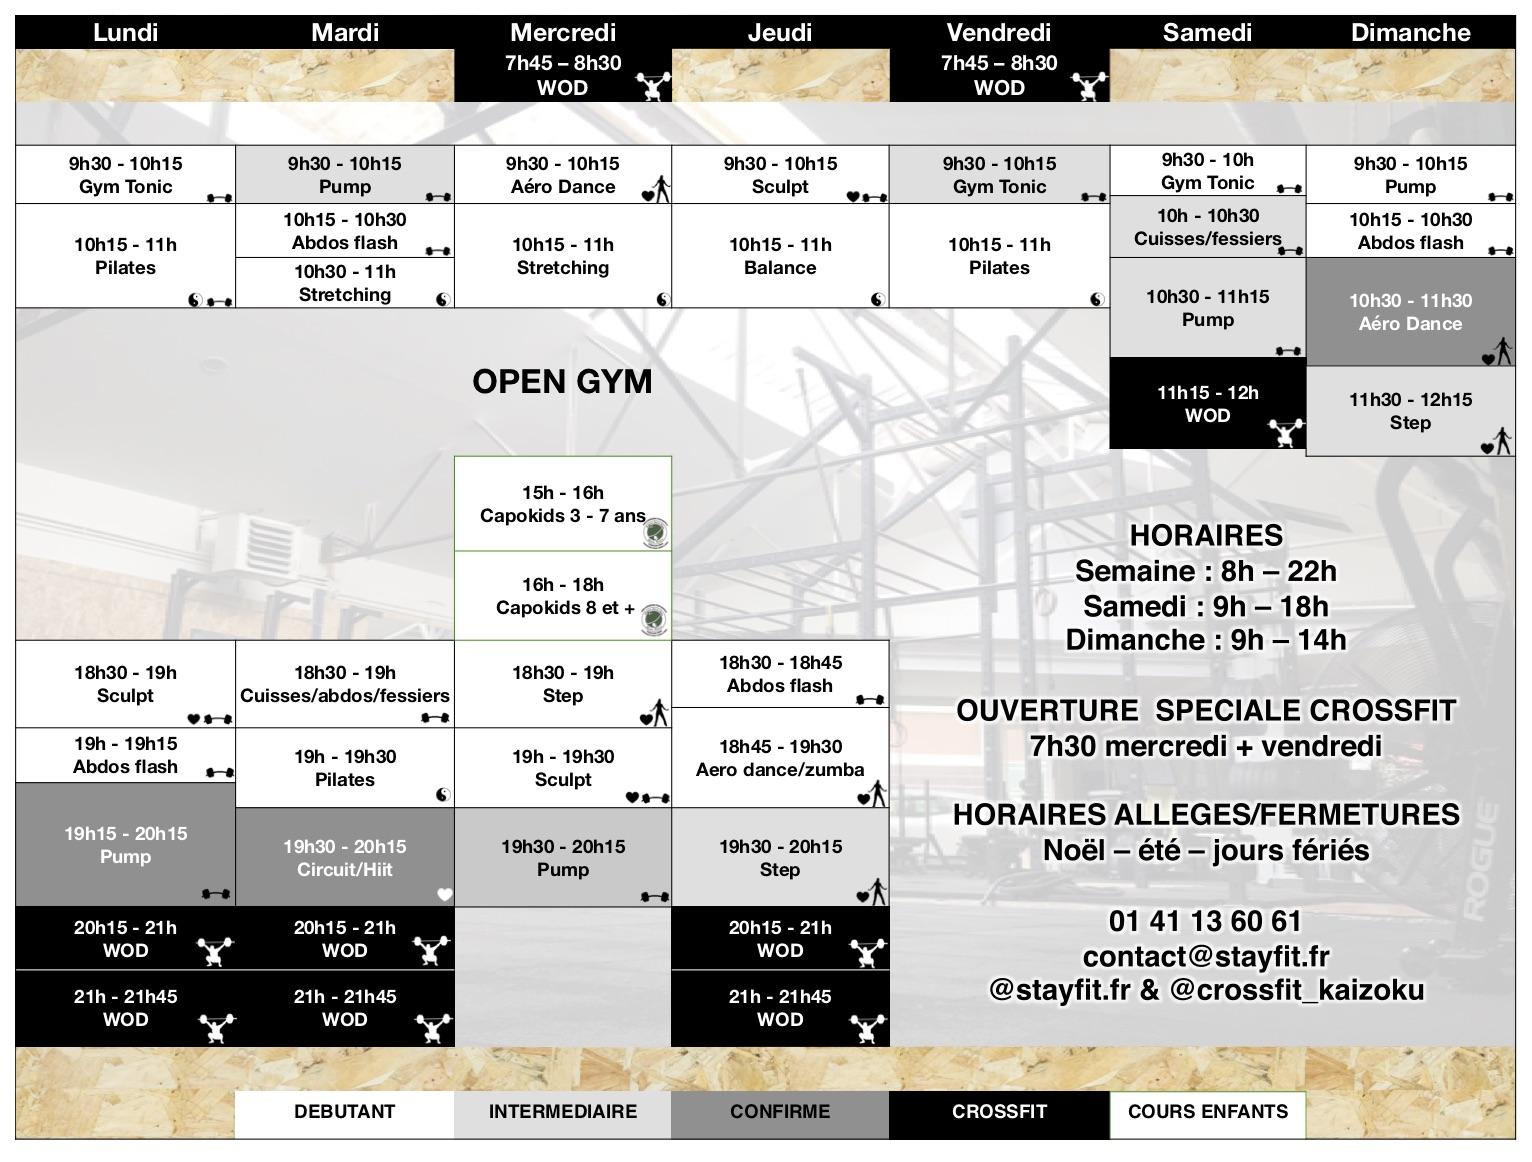 Planning CrossFit & Fitness Stay Fit Bourg-la-Reine